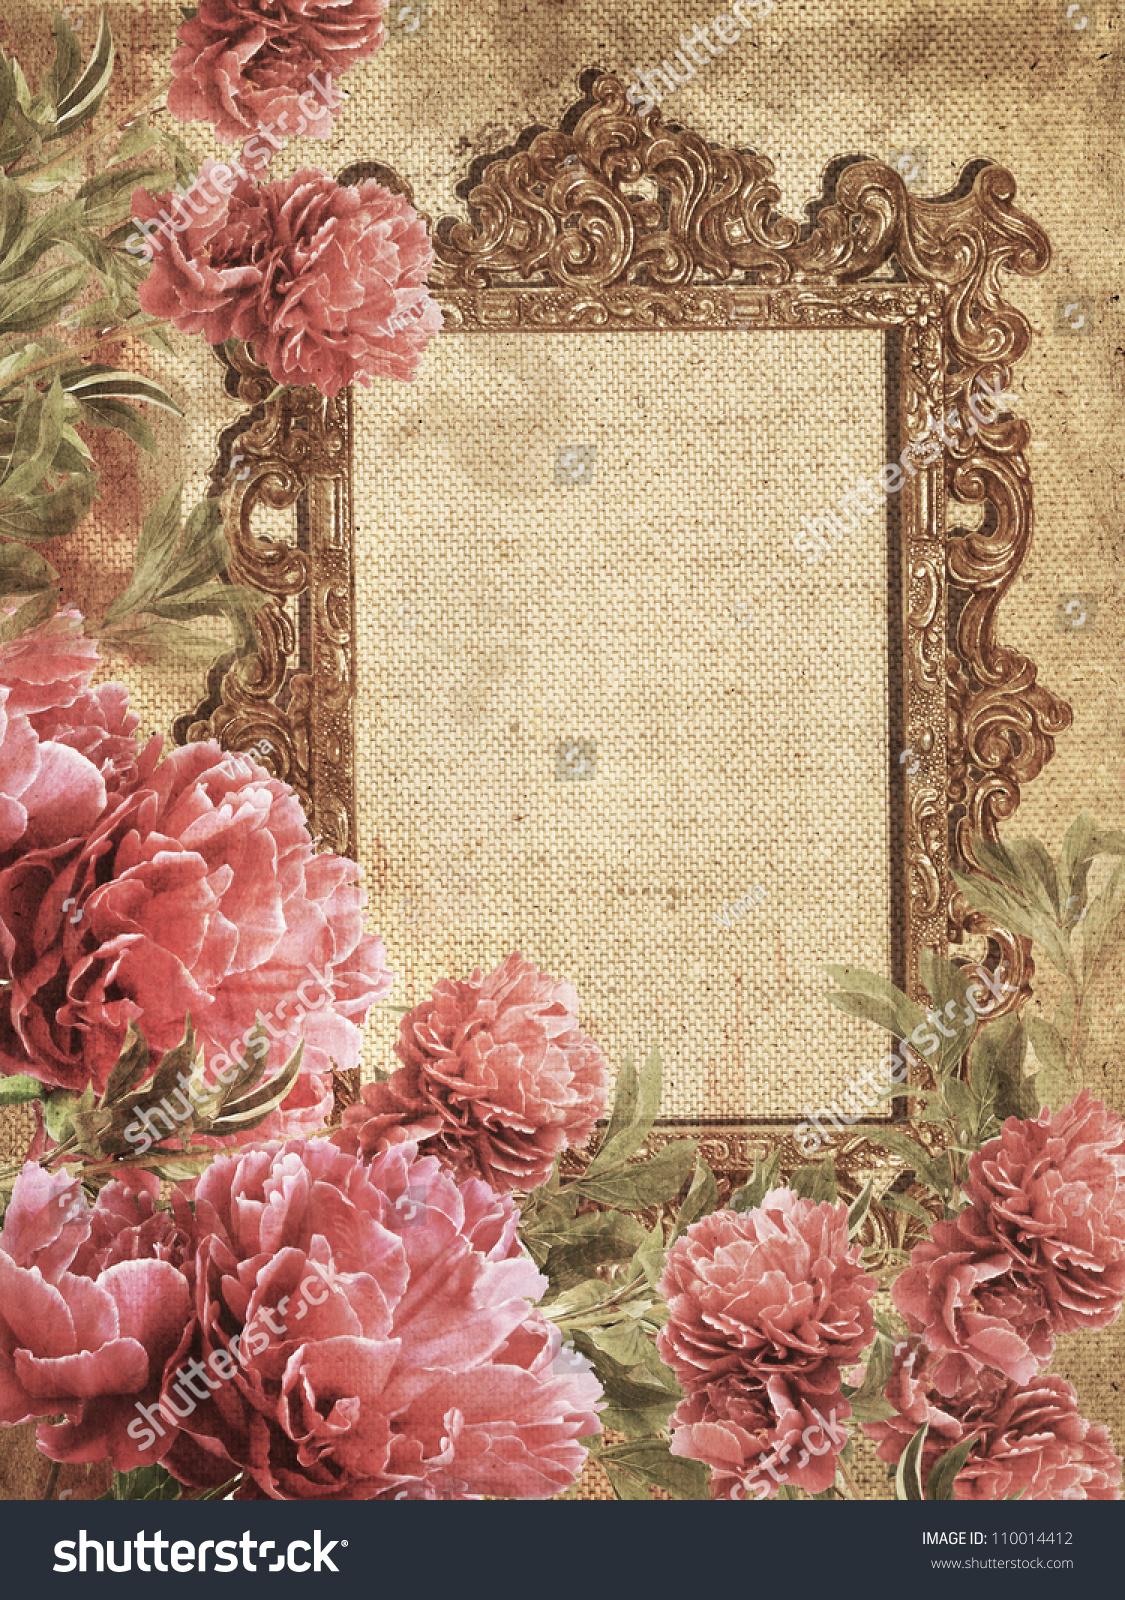 Romantic Vintage Photo Frame 110014412 Shutterstock